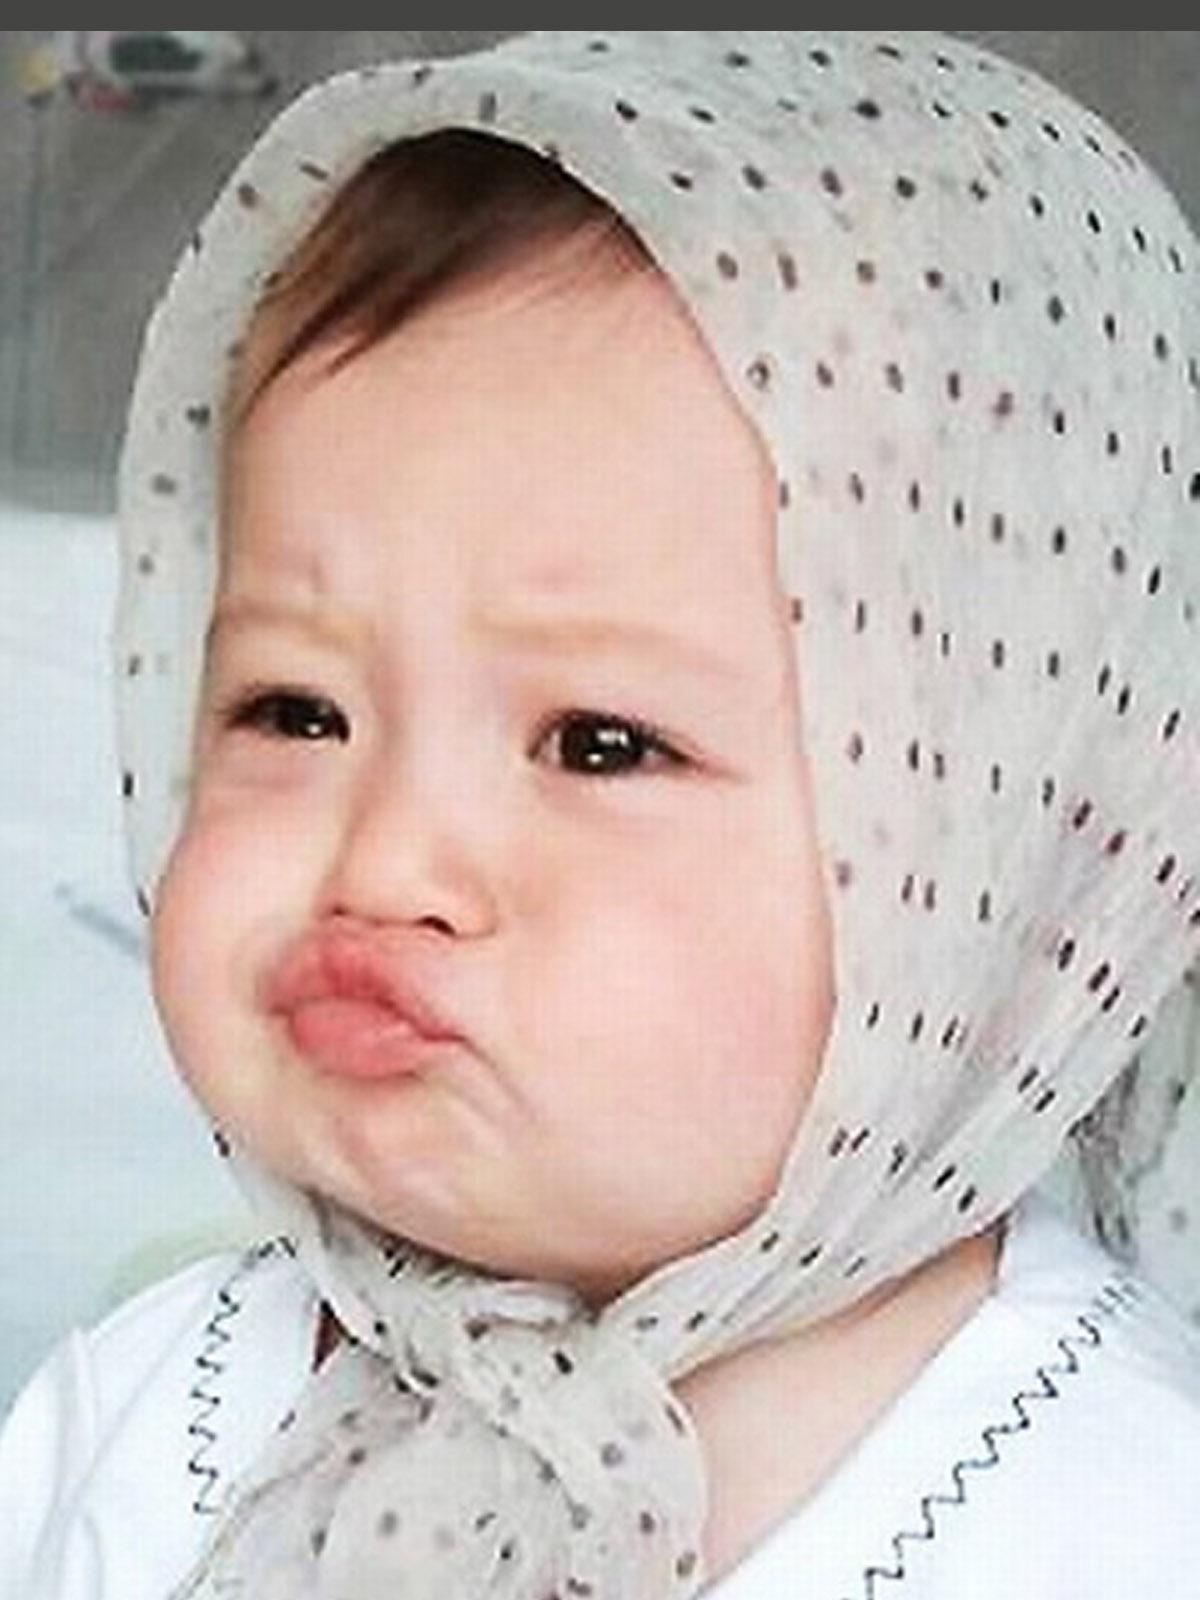 gambar baby comel sangat — brad.erva-doce